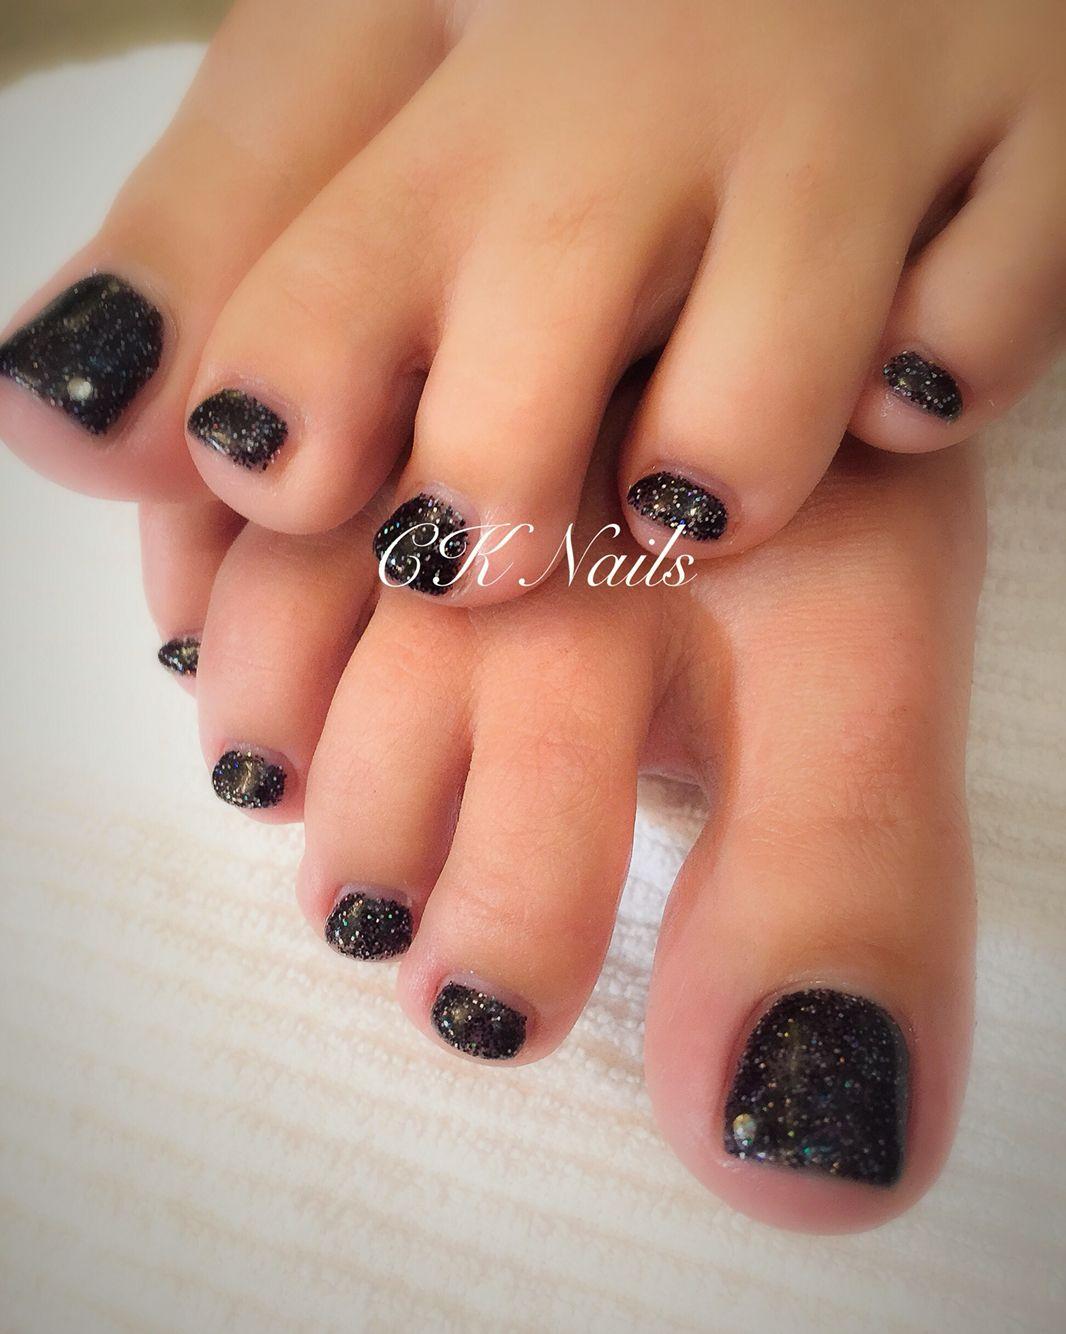 Gel pediaurora black pedicure paw print tattoo print